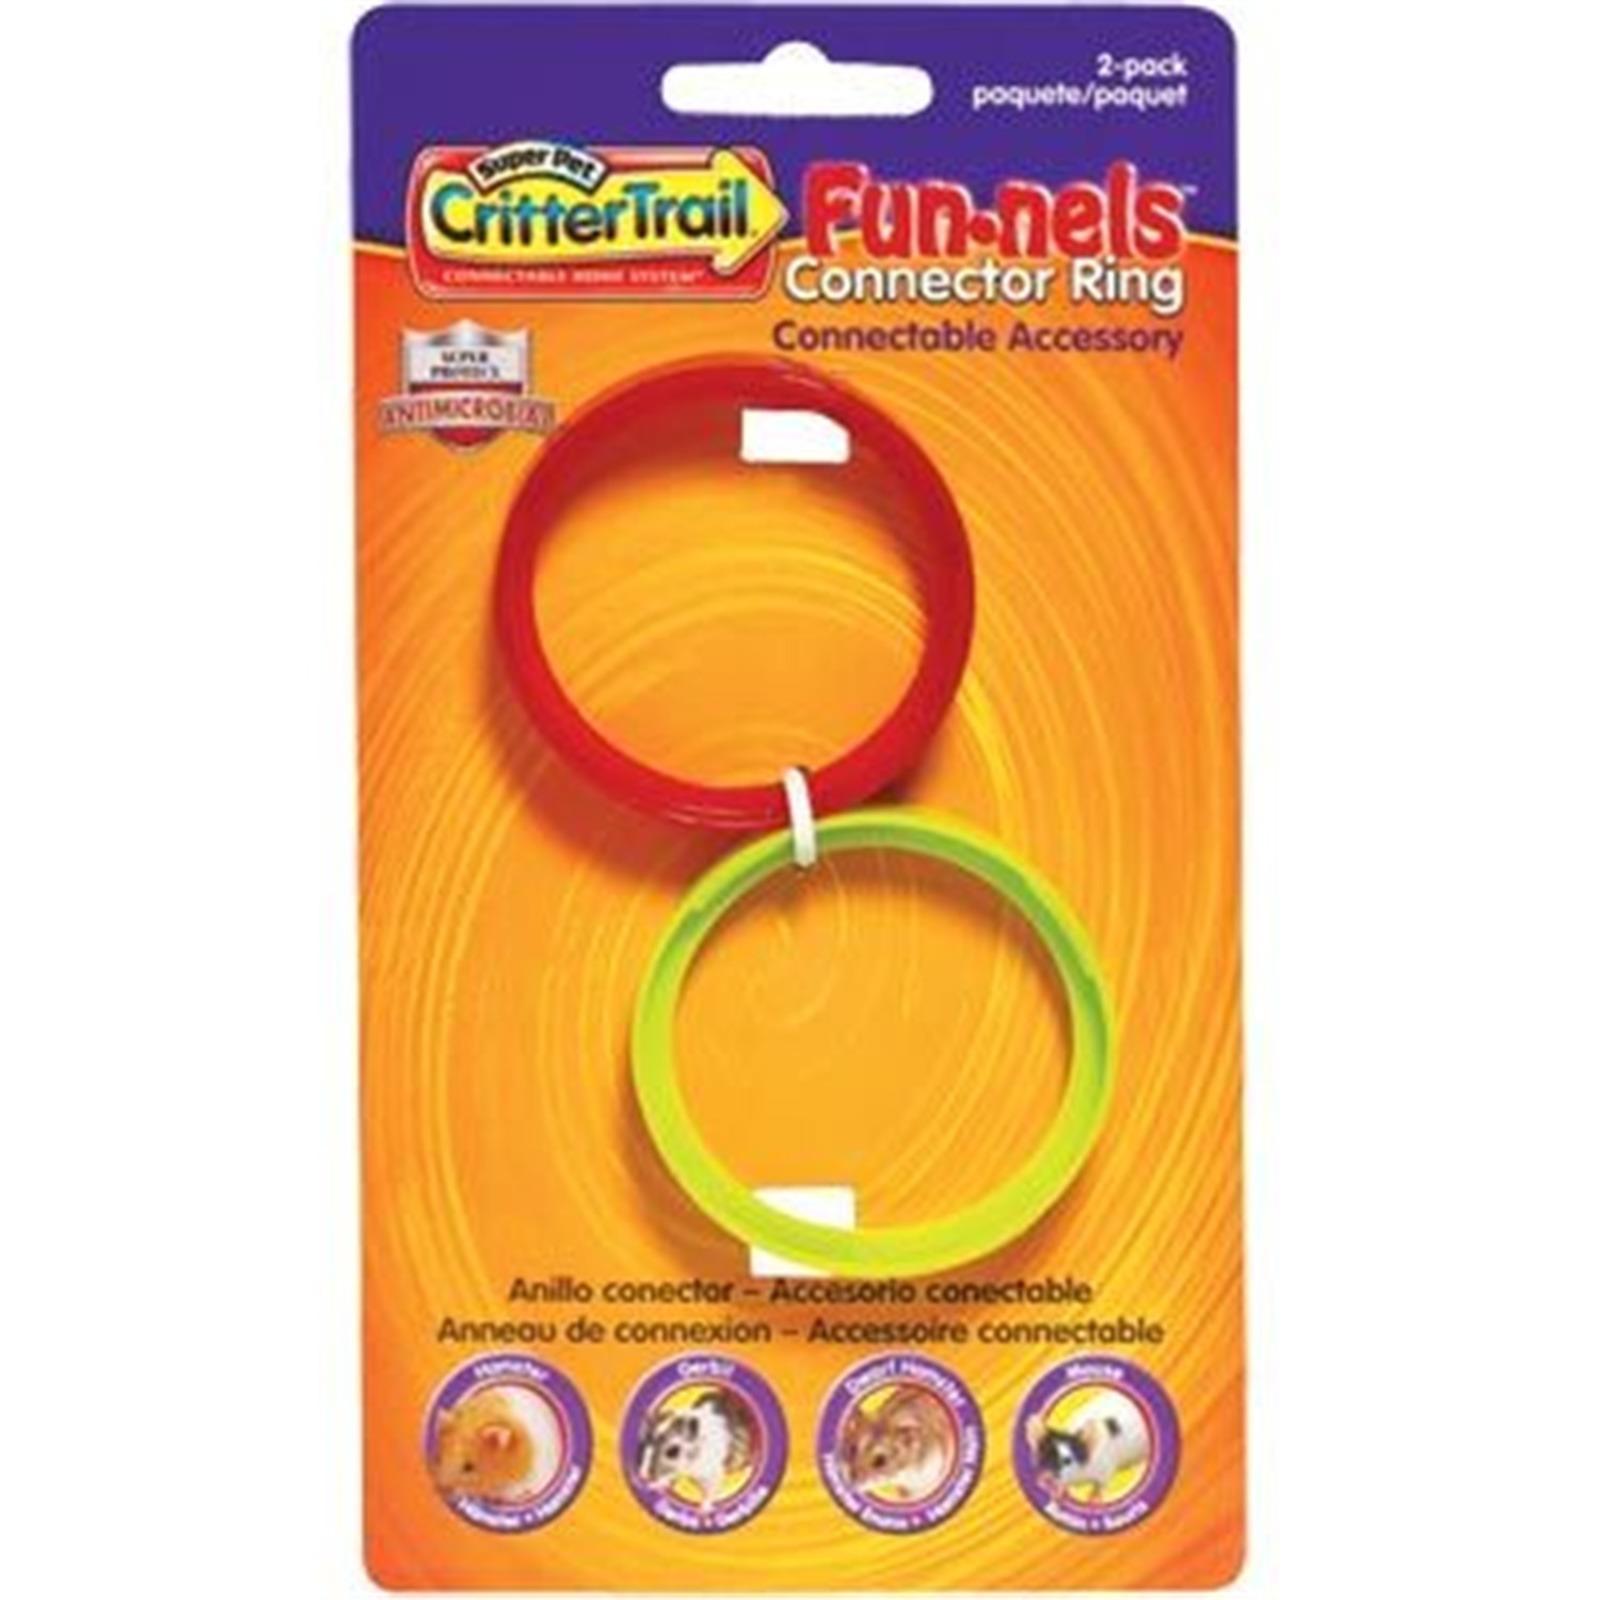 Super Pet Crittertrail Funnels Connect Rings